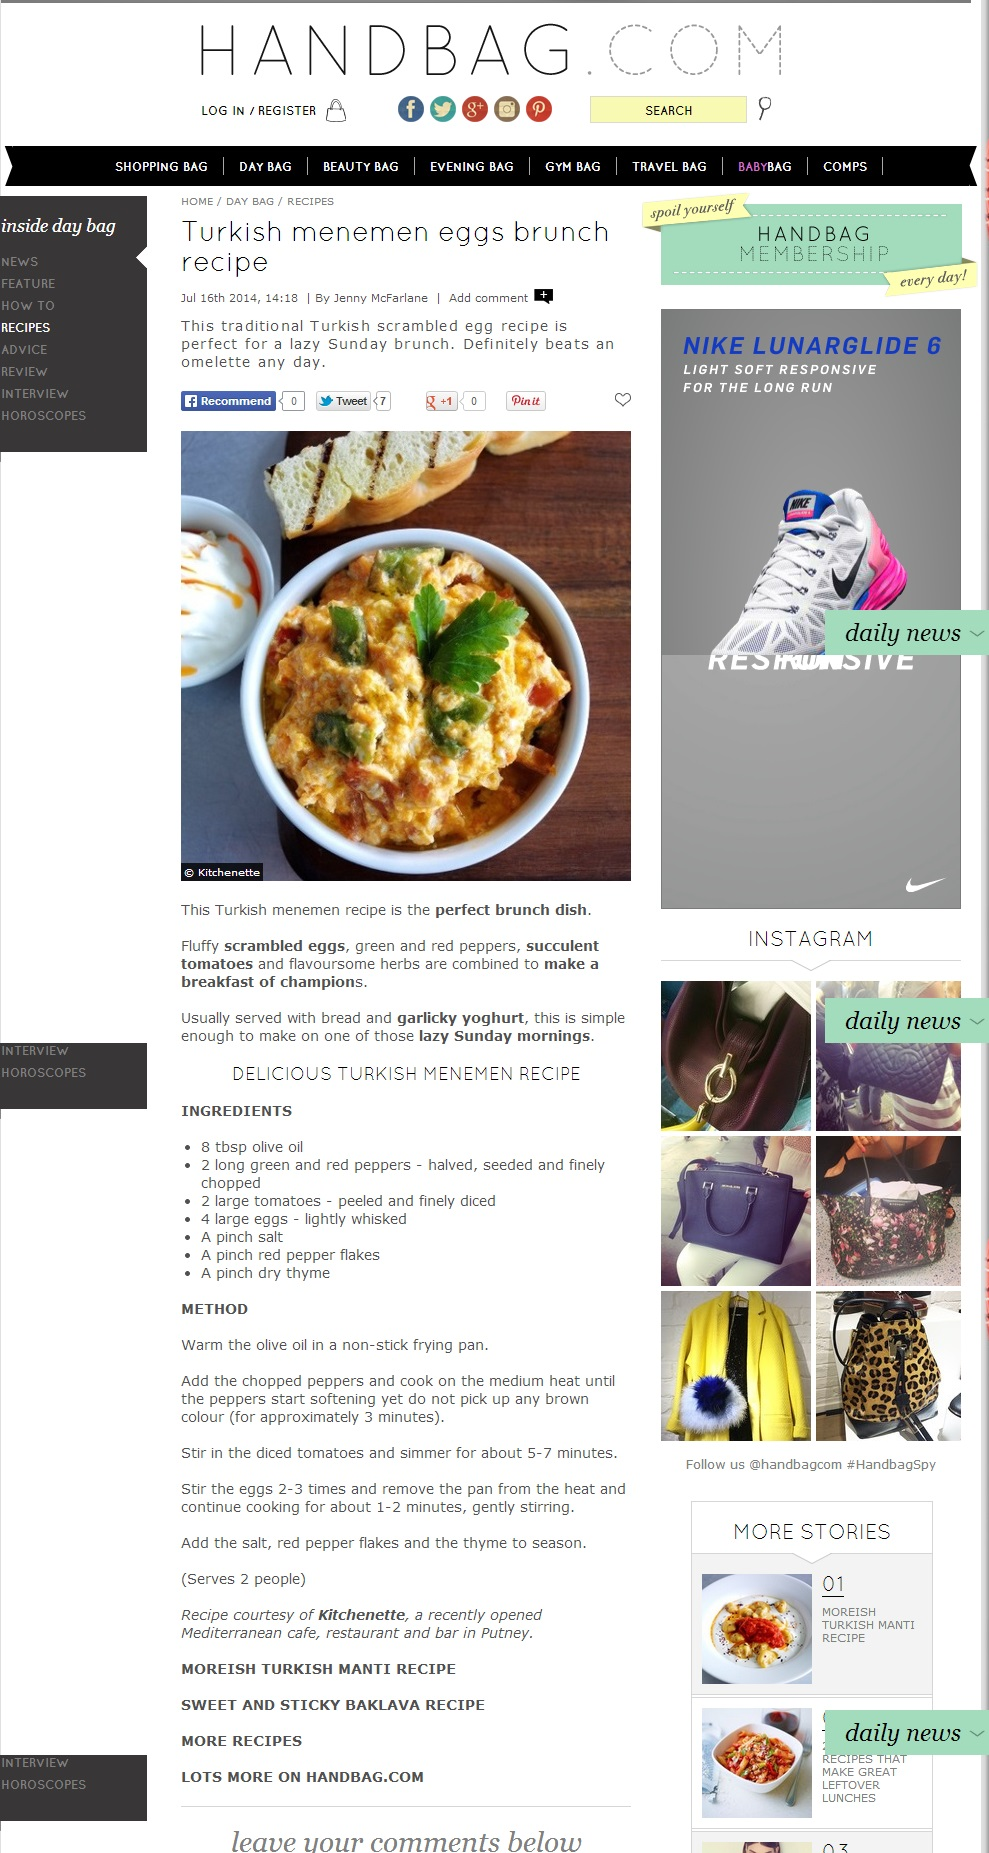 screencapture-www-handbag-com-day-bag-recipes-a584542-turkish-menemen-eggs-brunch-recipe-html